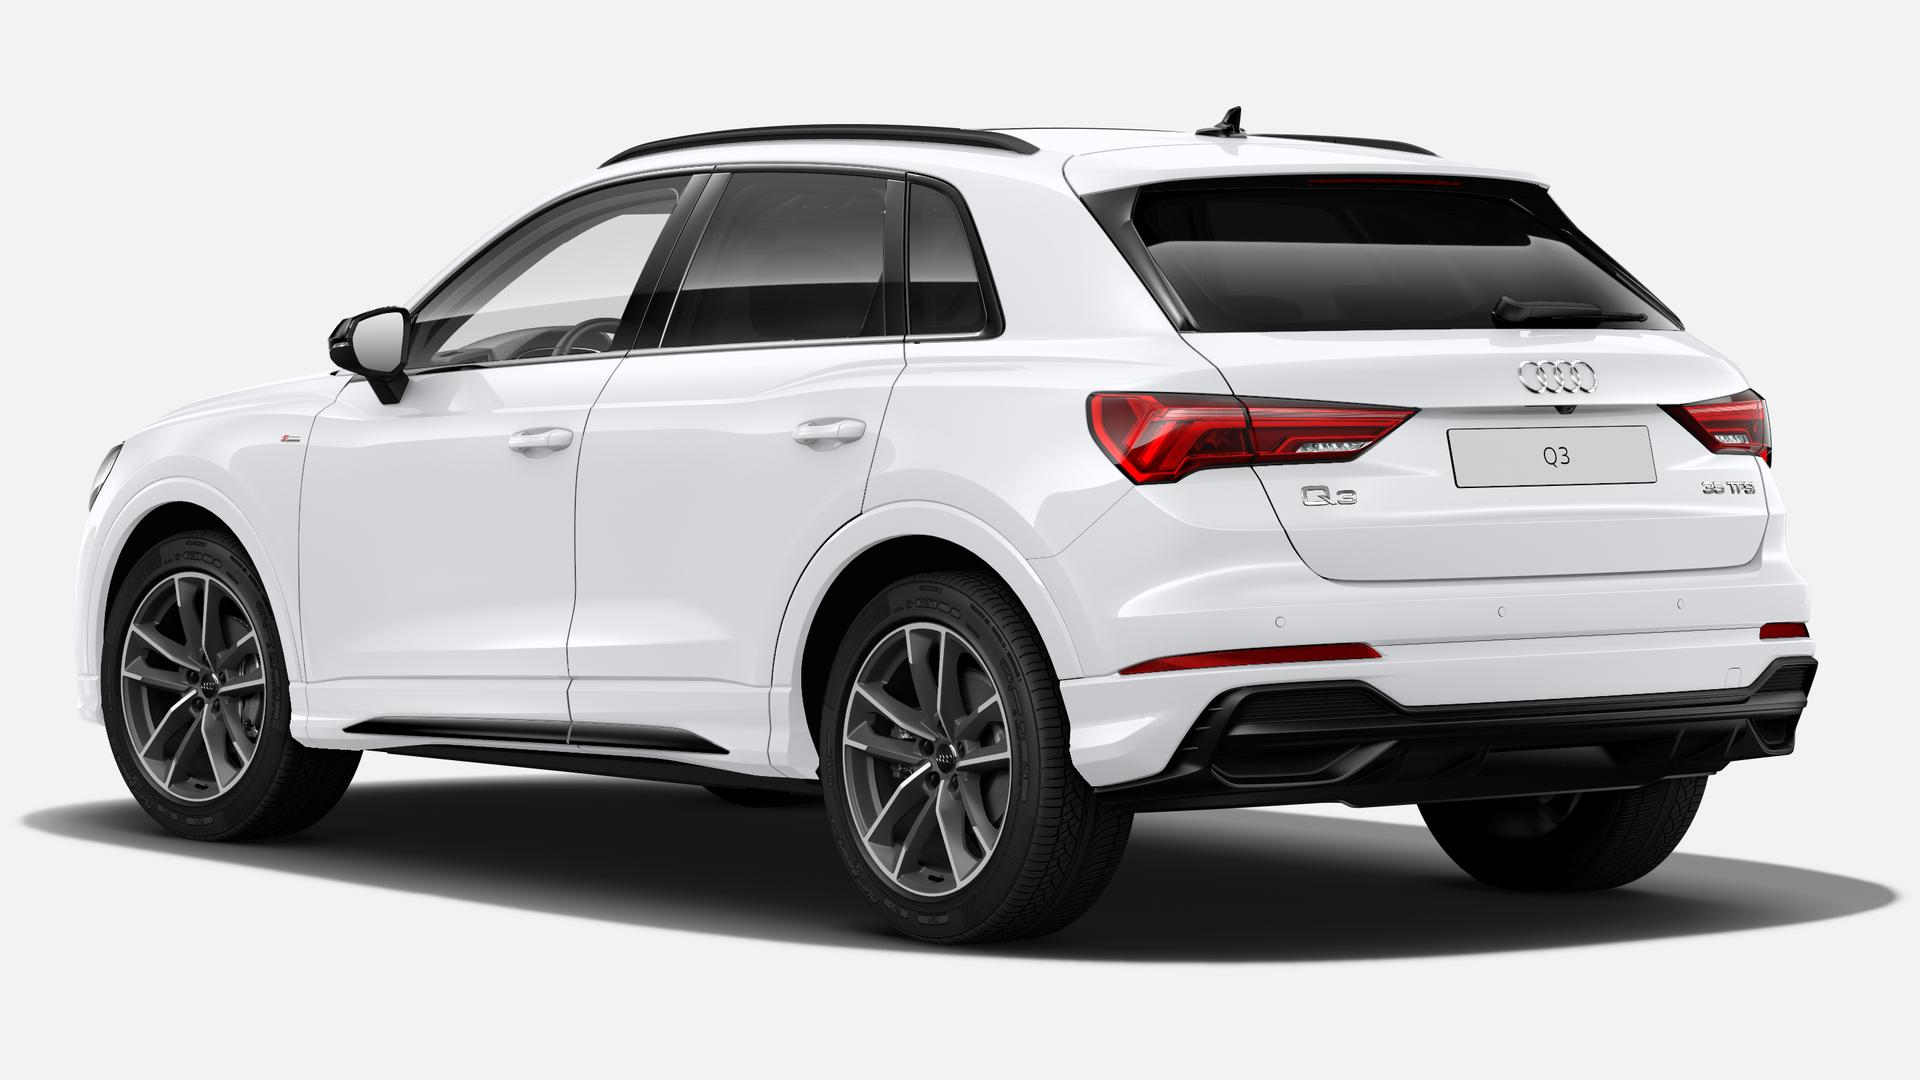 Vista Tres cuartos trasera izquierda de Audi Q3 35 TFSI Black line S Tronic 110 kW (150 CV)